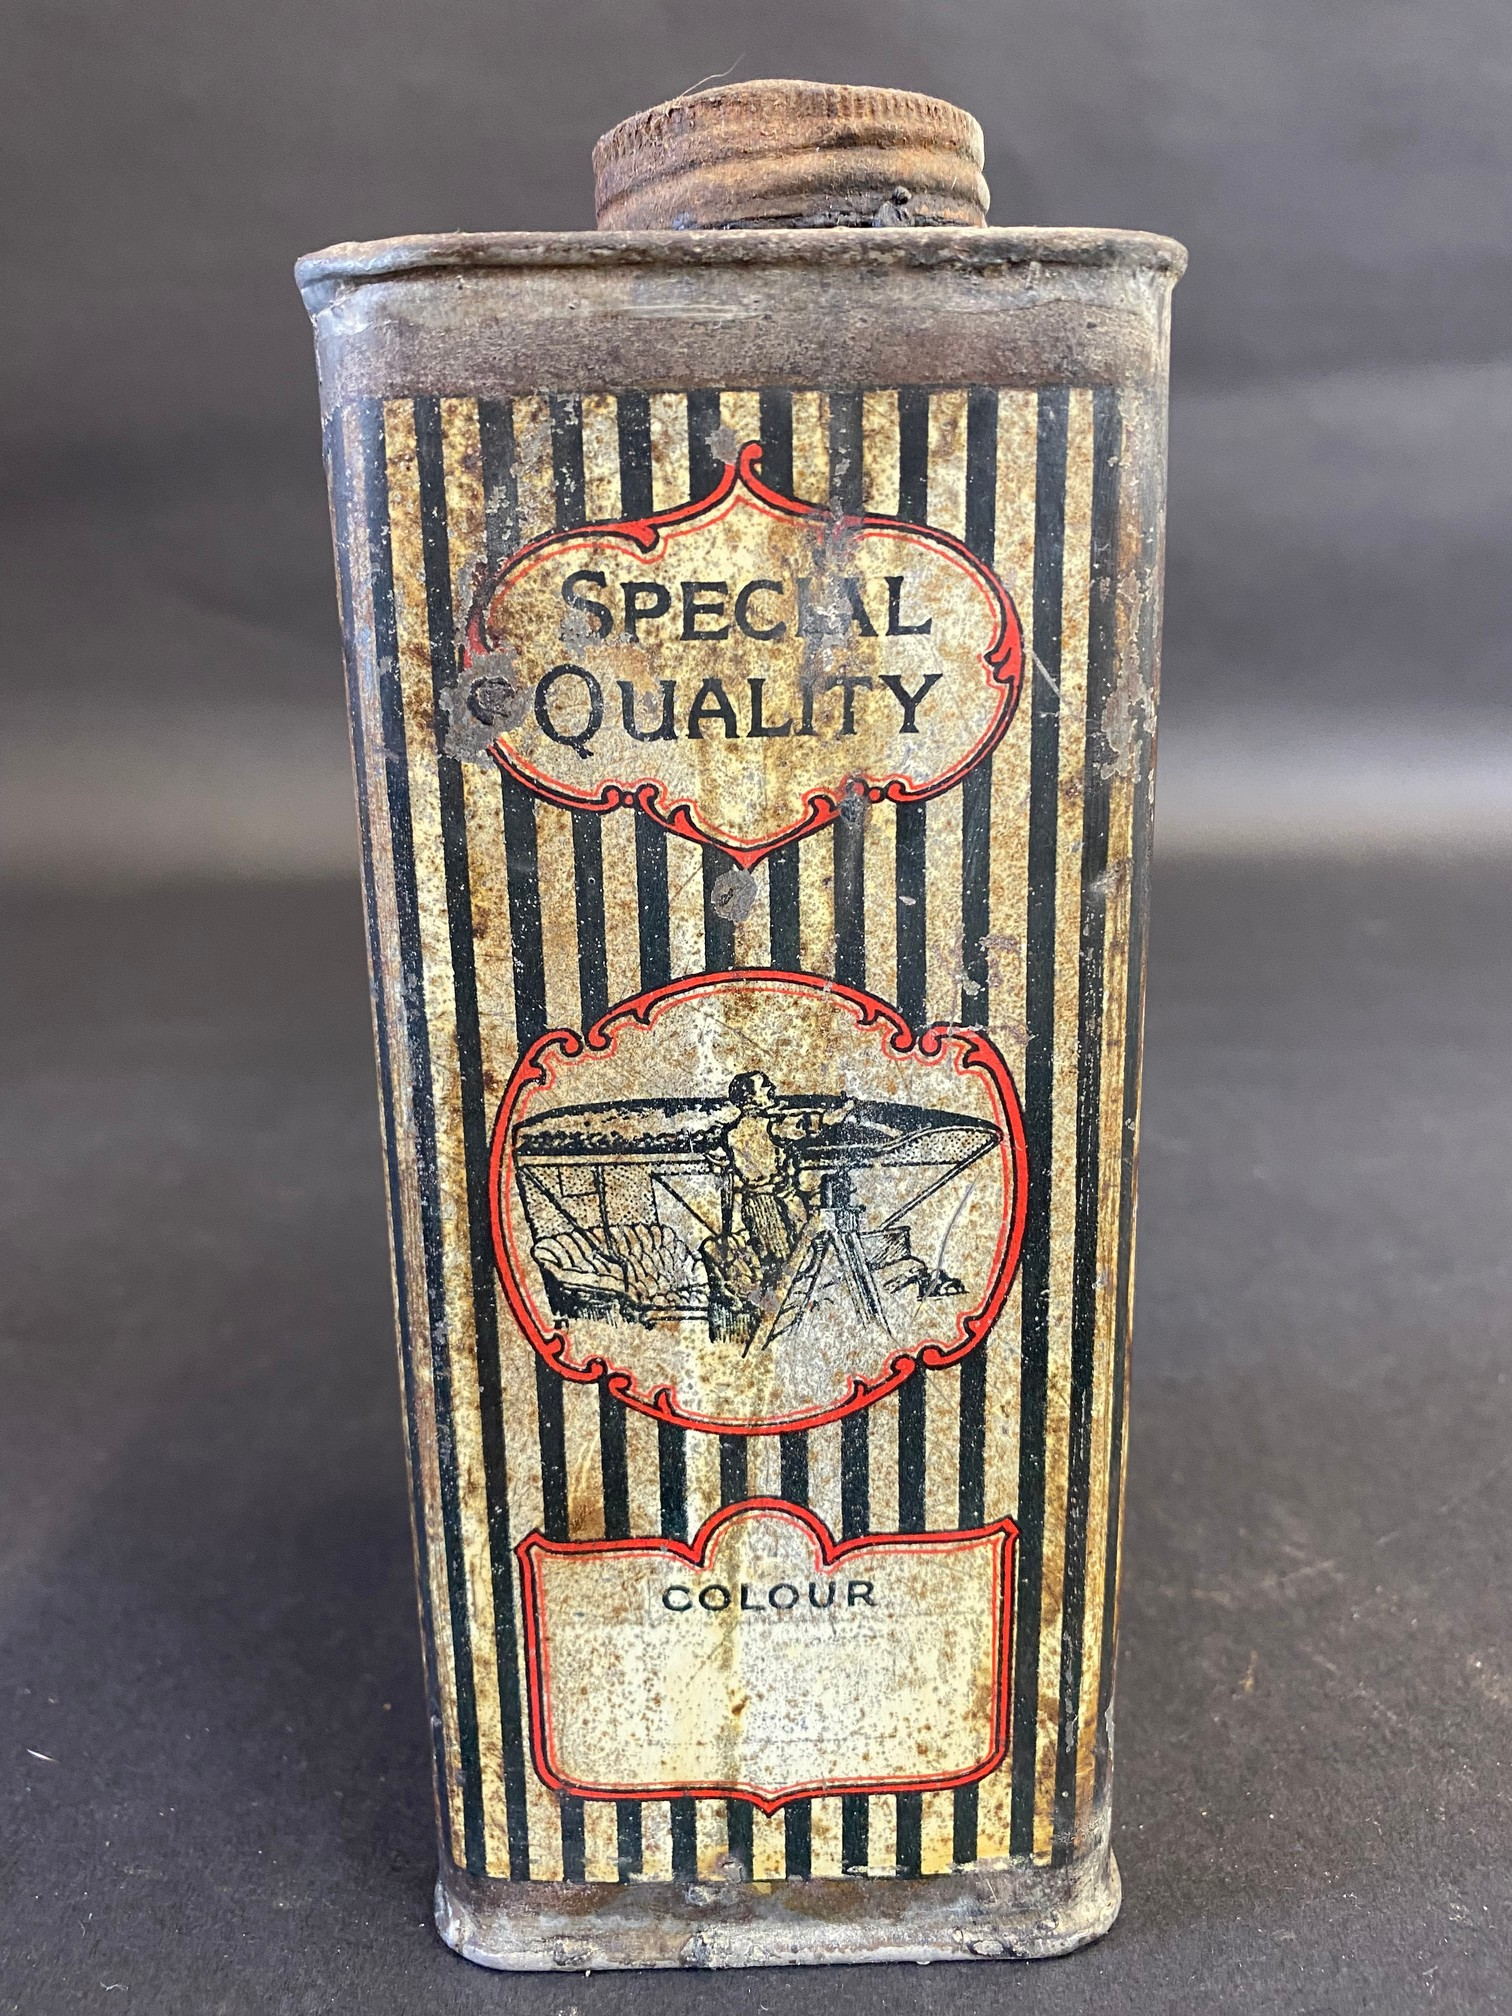 An Accordion Flexible Paint rectangular quart can. - Image 2 of 6